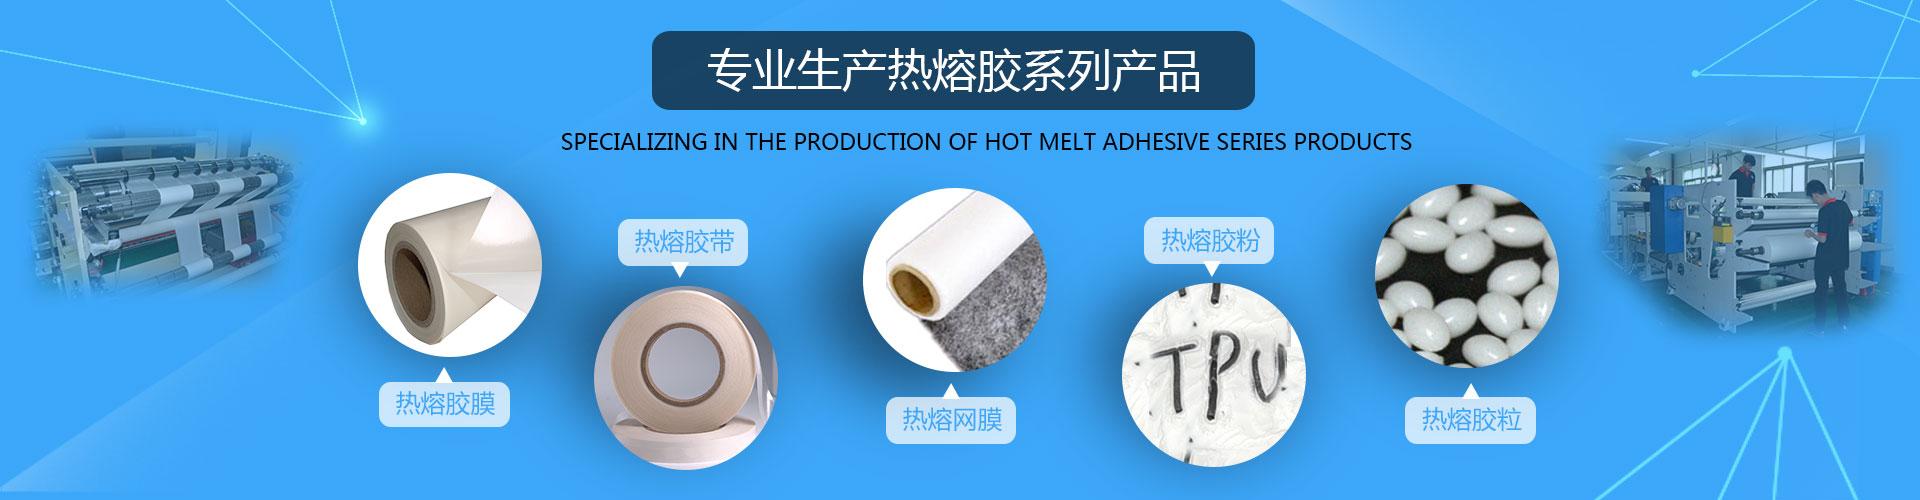 热熔胶膜,TPU热熔胶膜,PO热熔胶膜,PES热熔胶膜